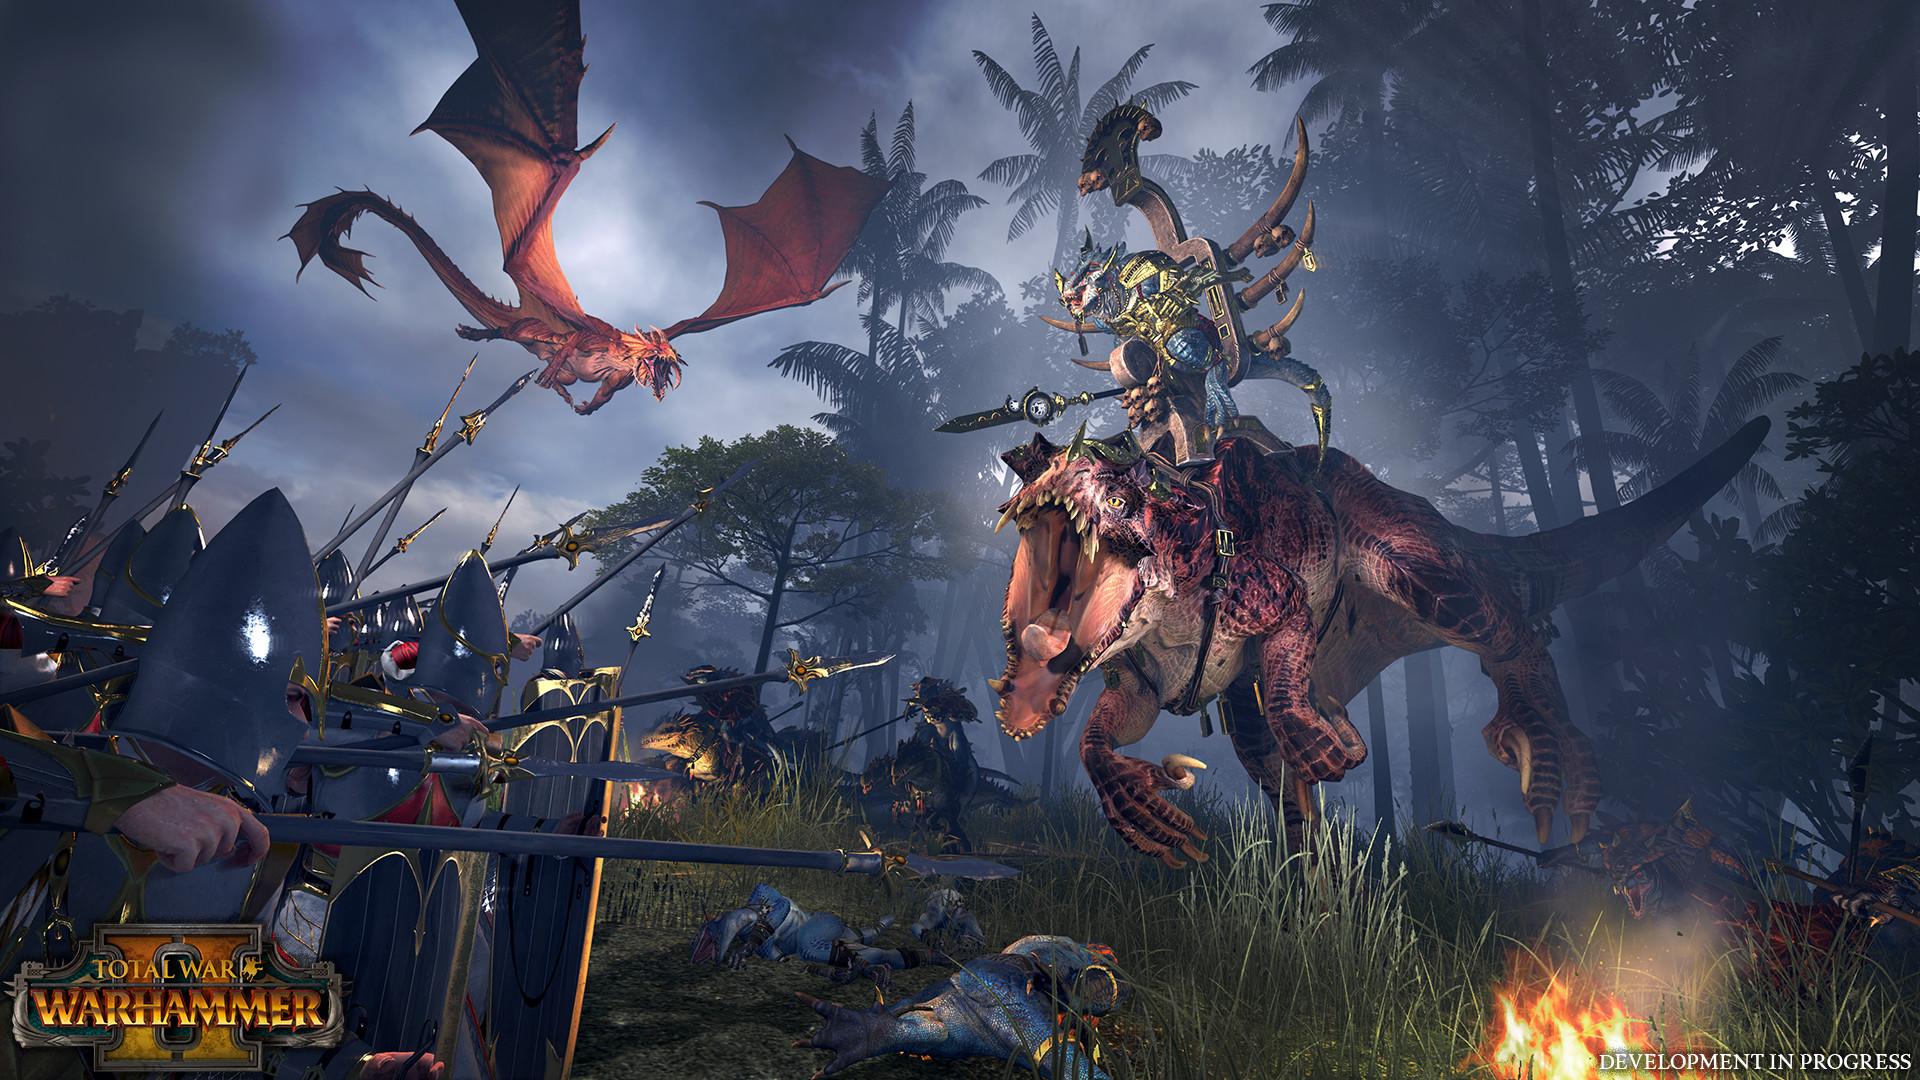 Total War: Warhammer II Free